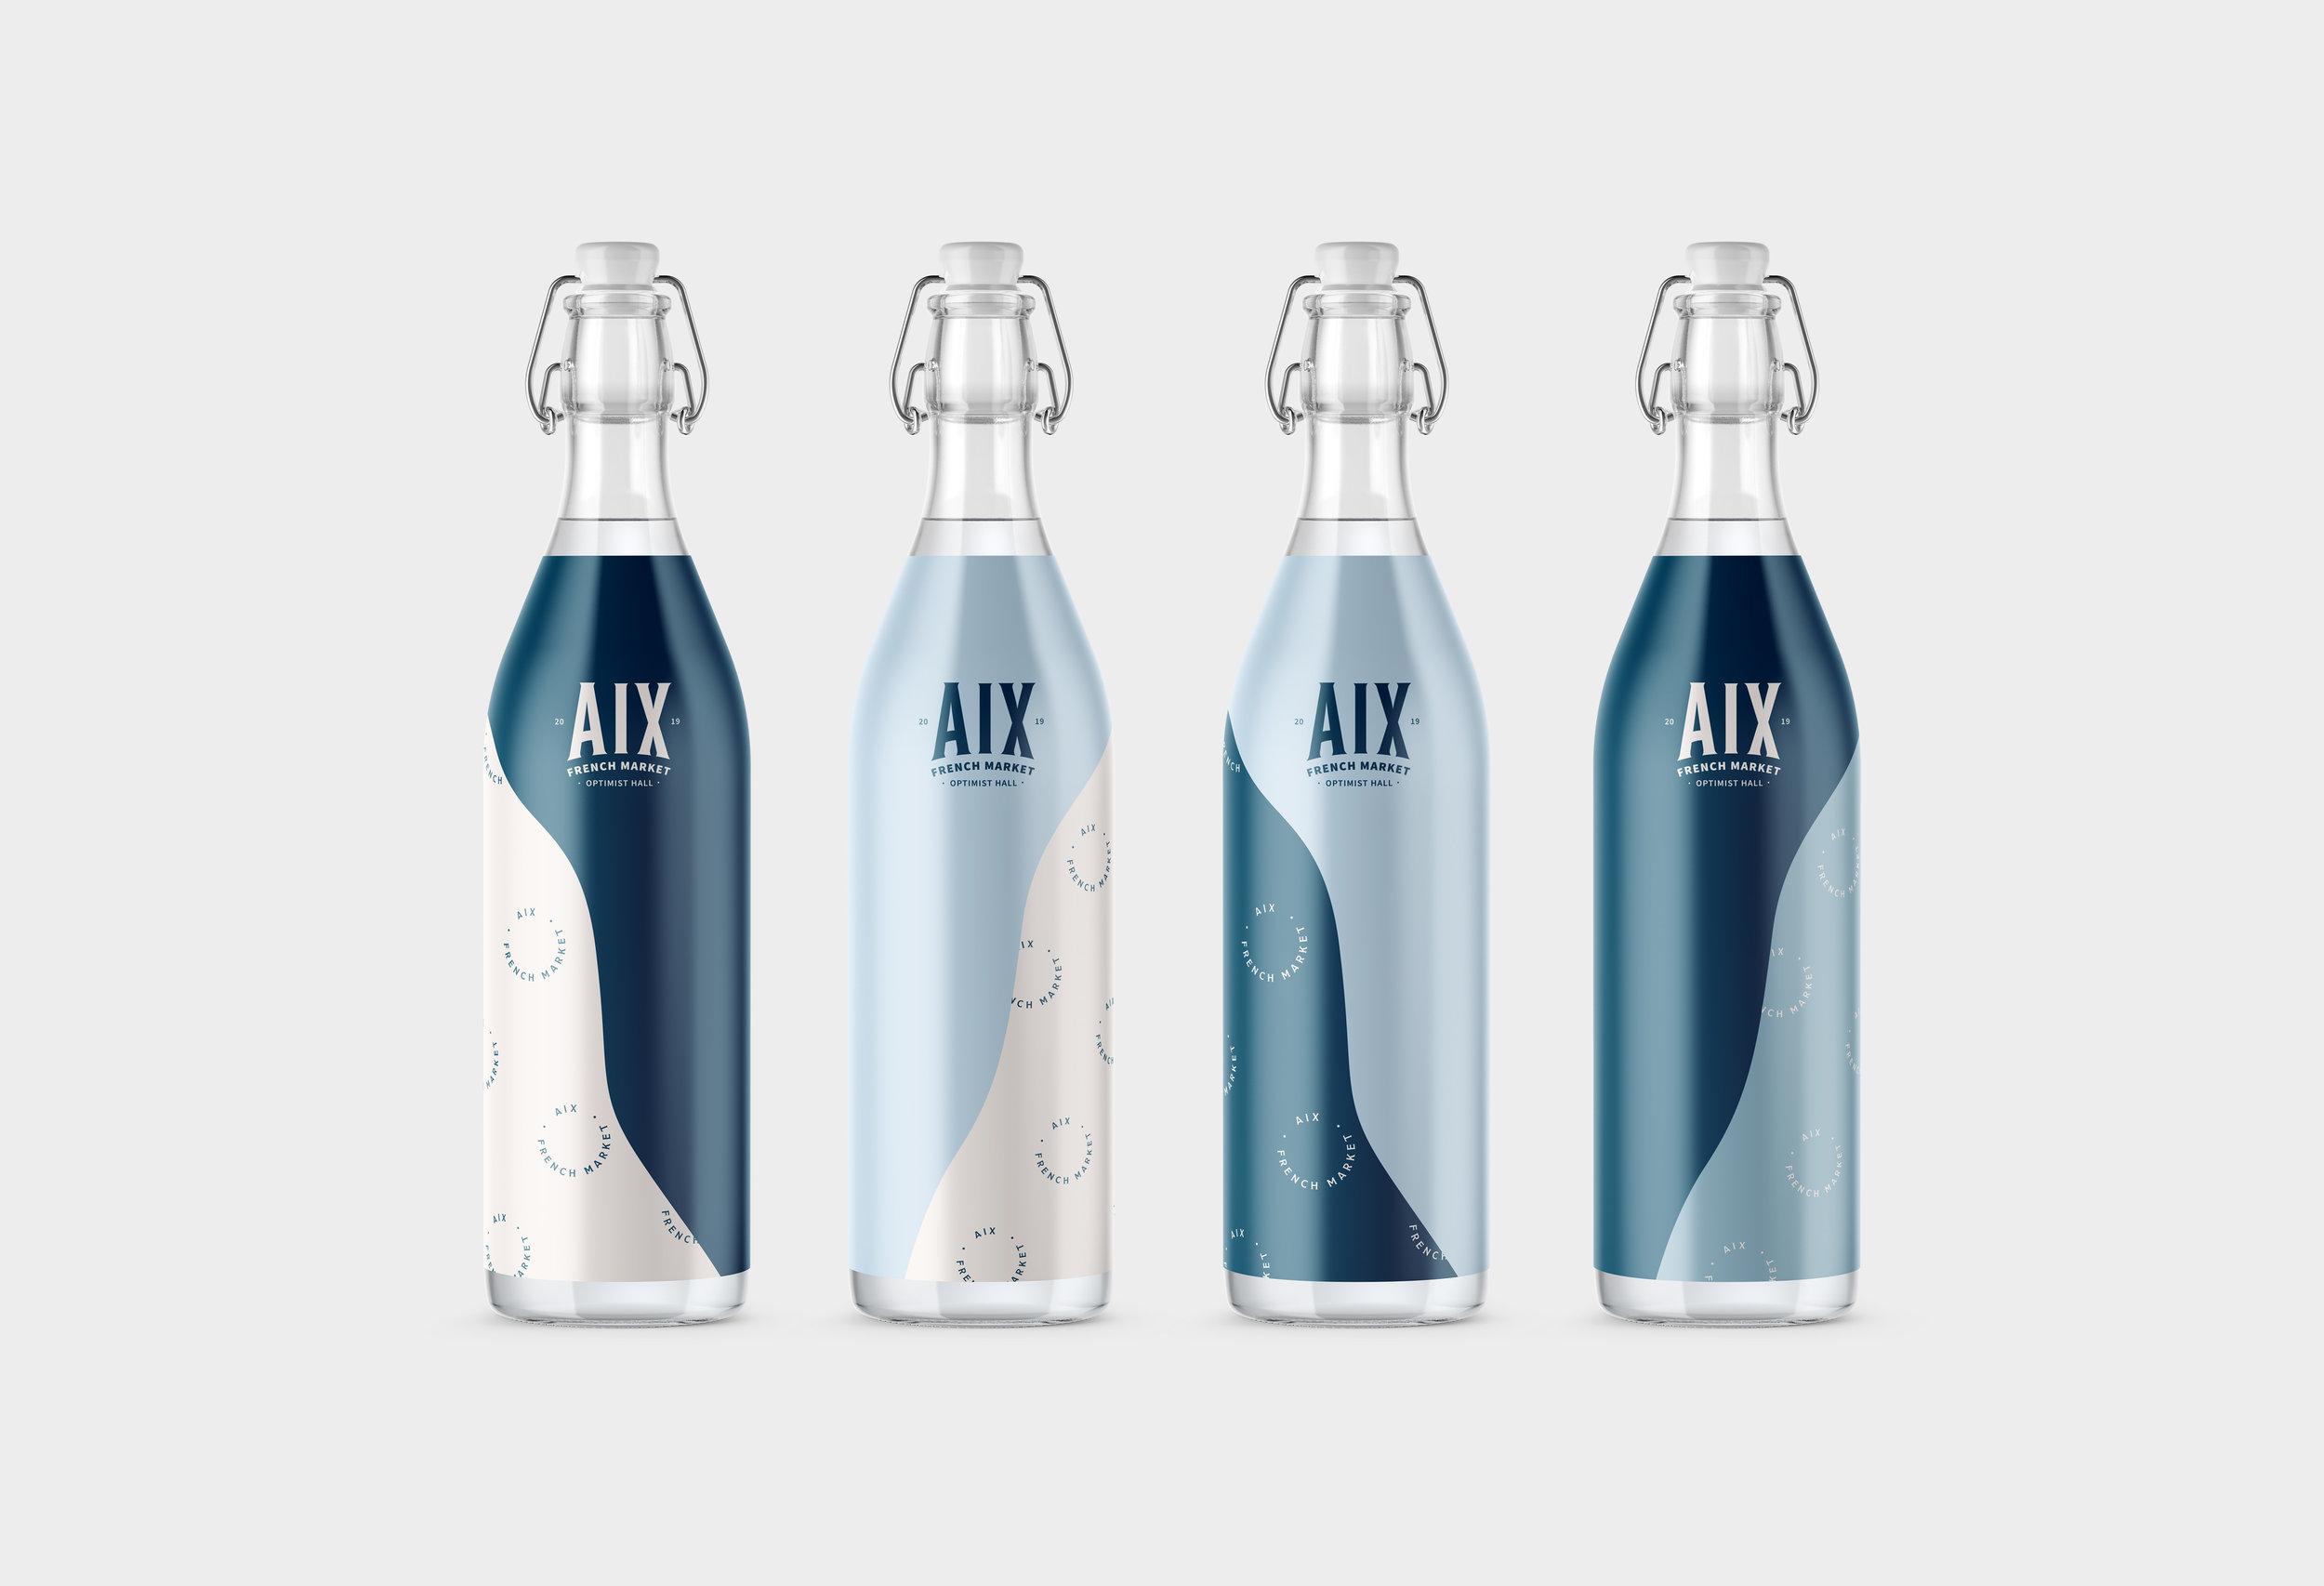 Ana-Juan-Gomez-branding-design-AIX-bottle.jpg